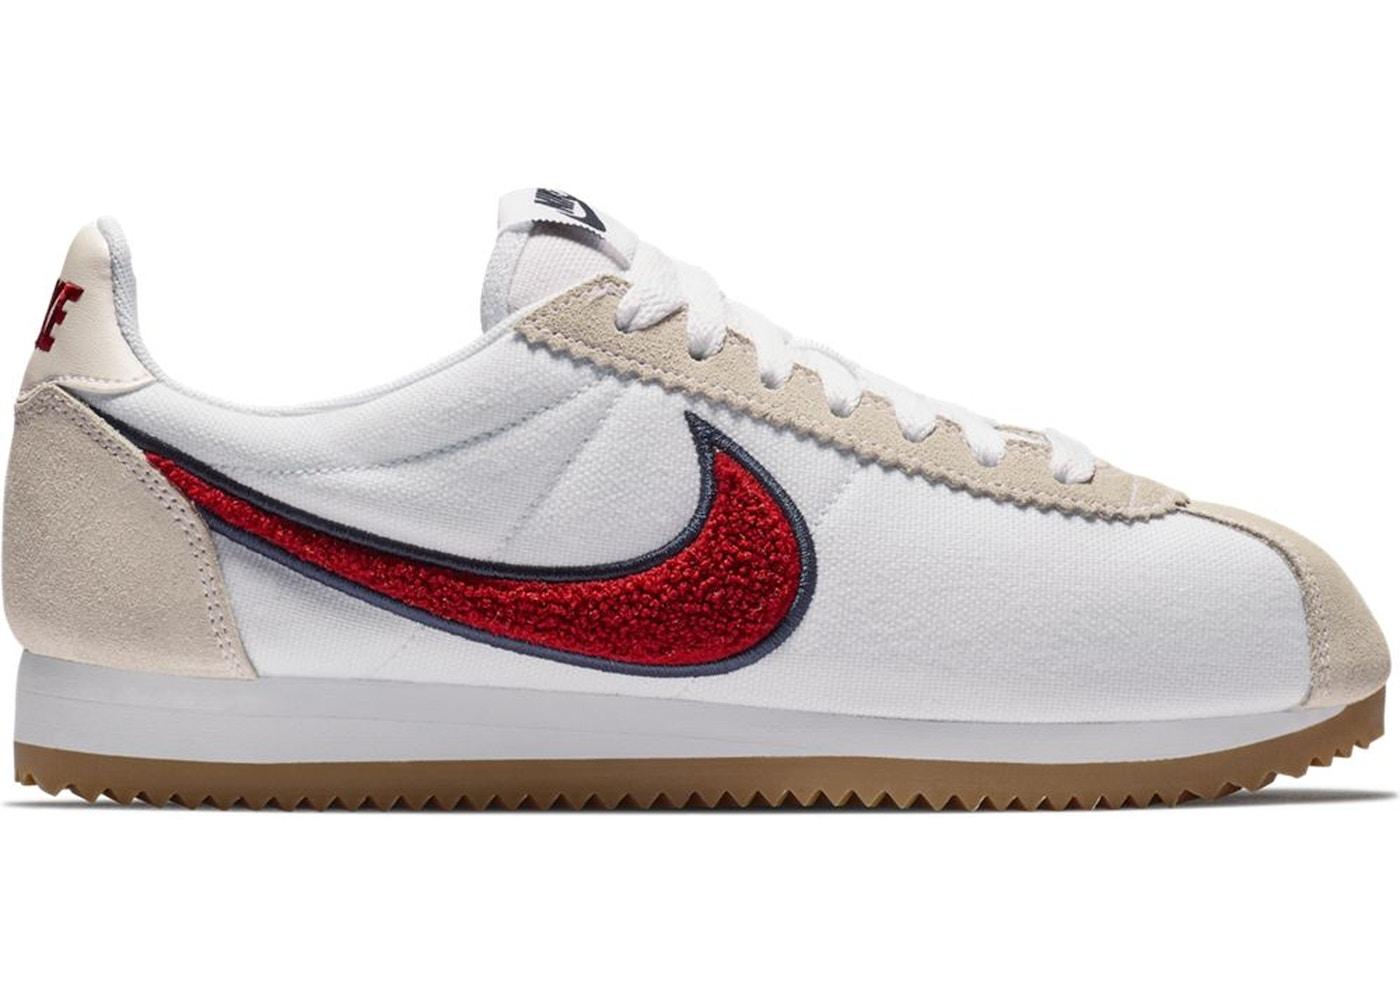 online store 43df3 d184e Nike Classic Cortez Chenille Swoosh Red Crush (W) - 905614-103